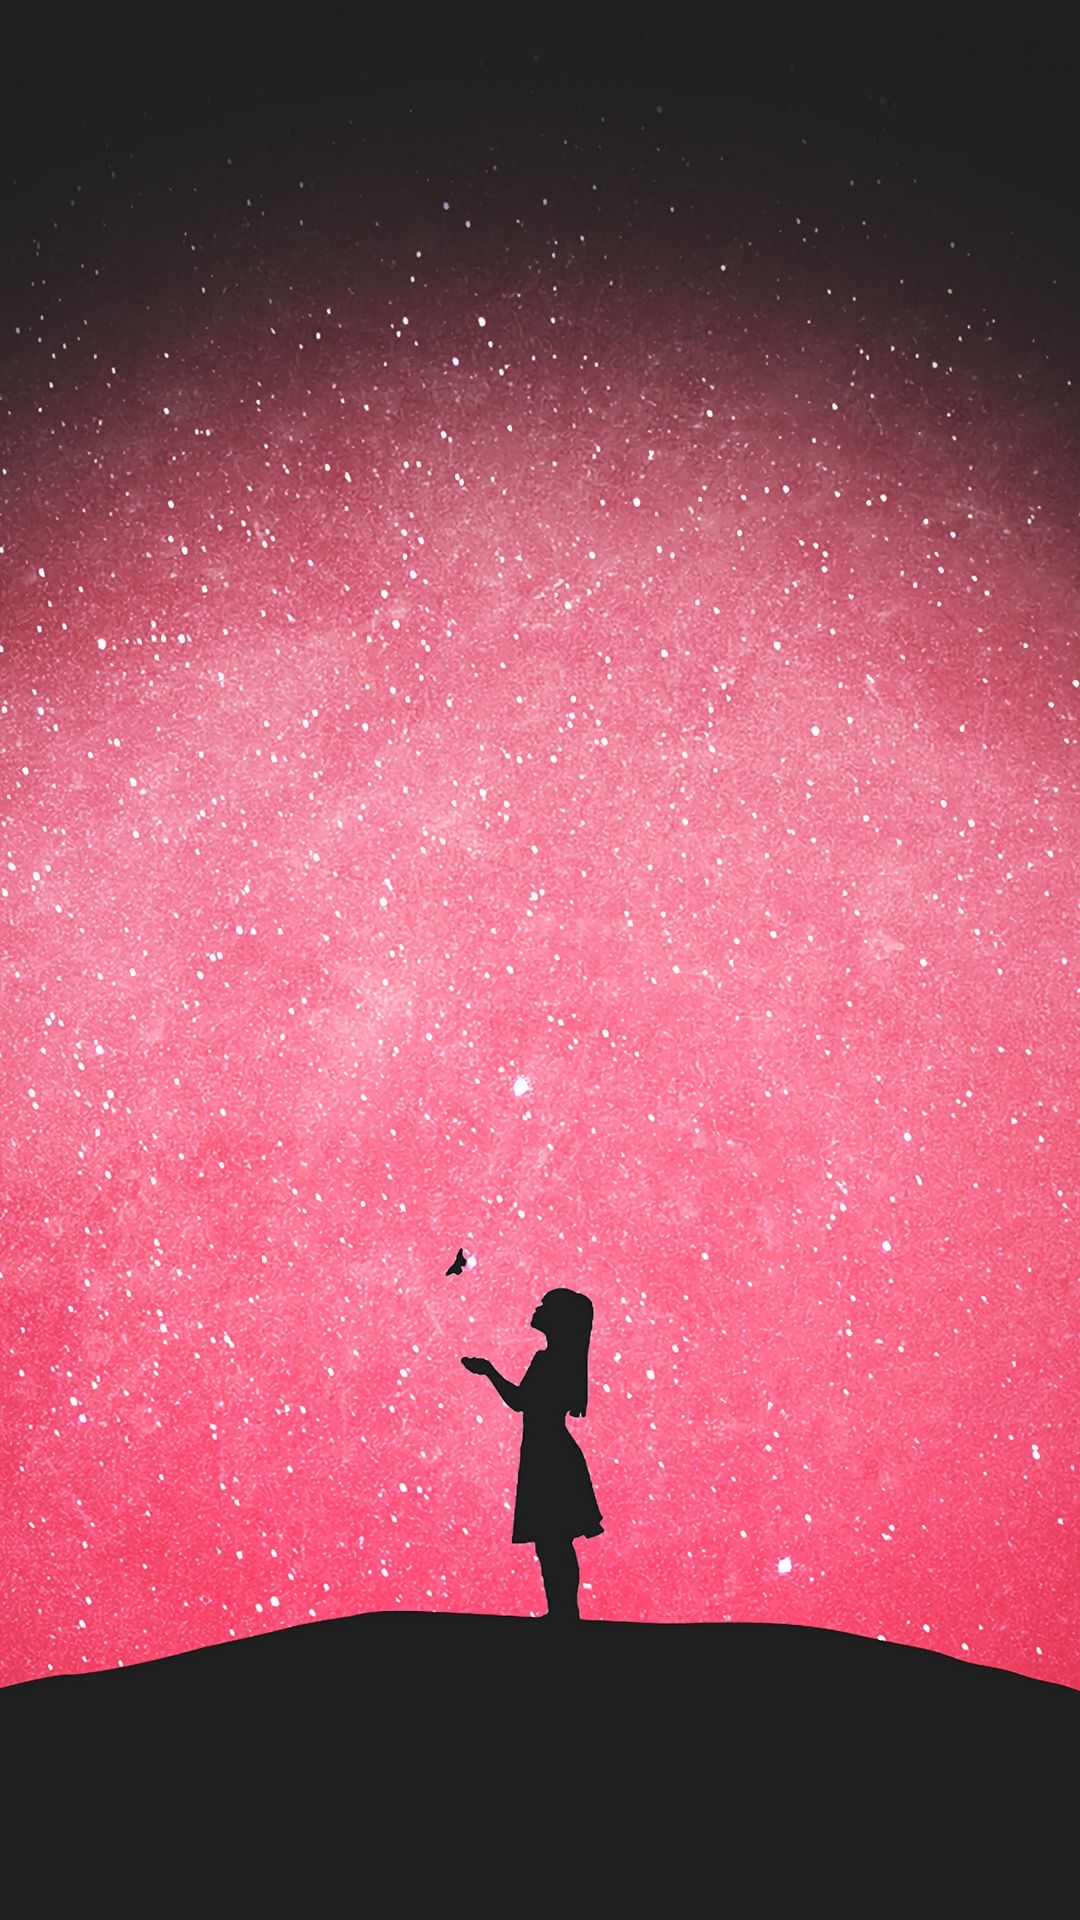 Butterfly Silhouette Girl Vector Wallpaper Lockscreen Mobile Android Ios Infinitywallpaper Art Wallpaper Cute Wallpapers Cute Wallpaper Backgrounds